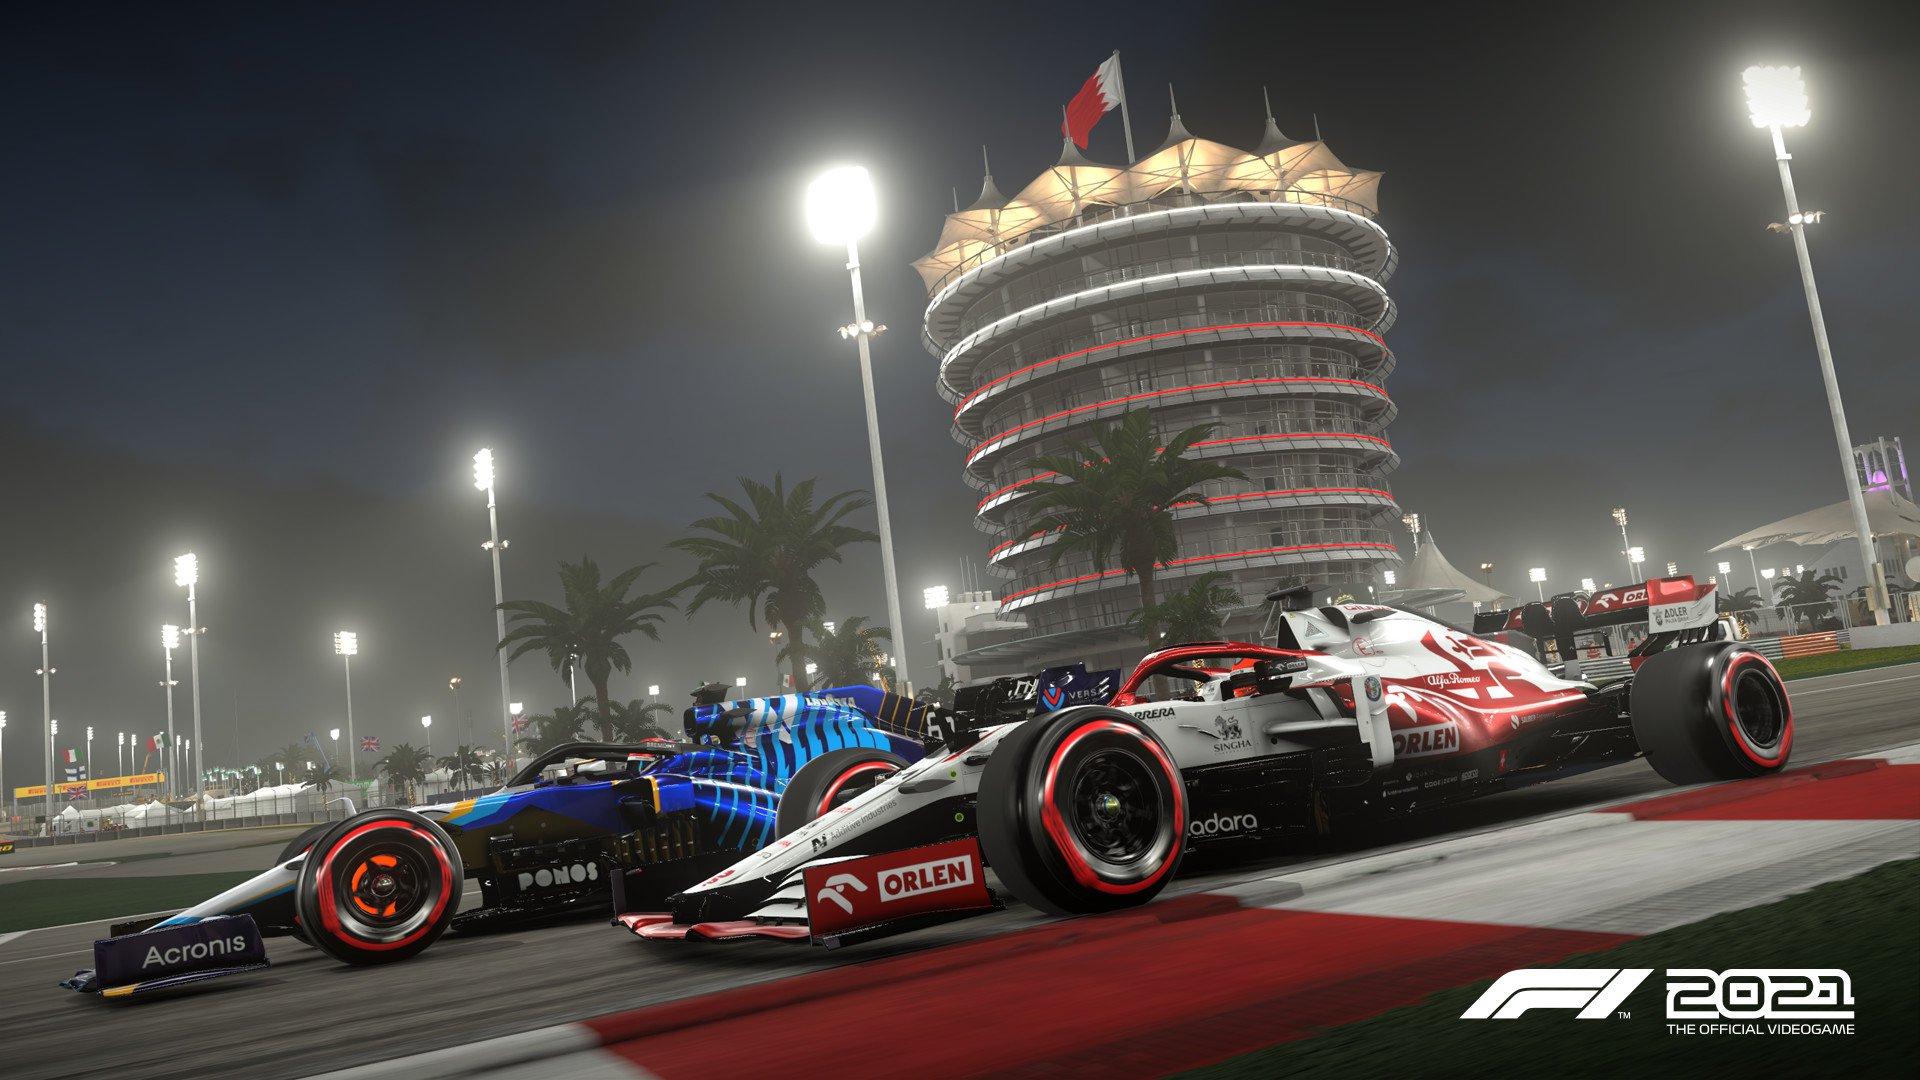 F1 2021 8